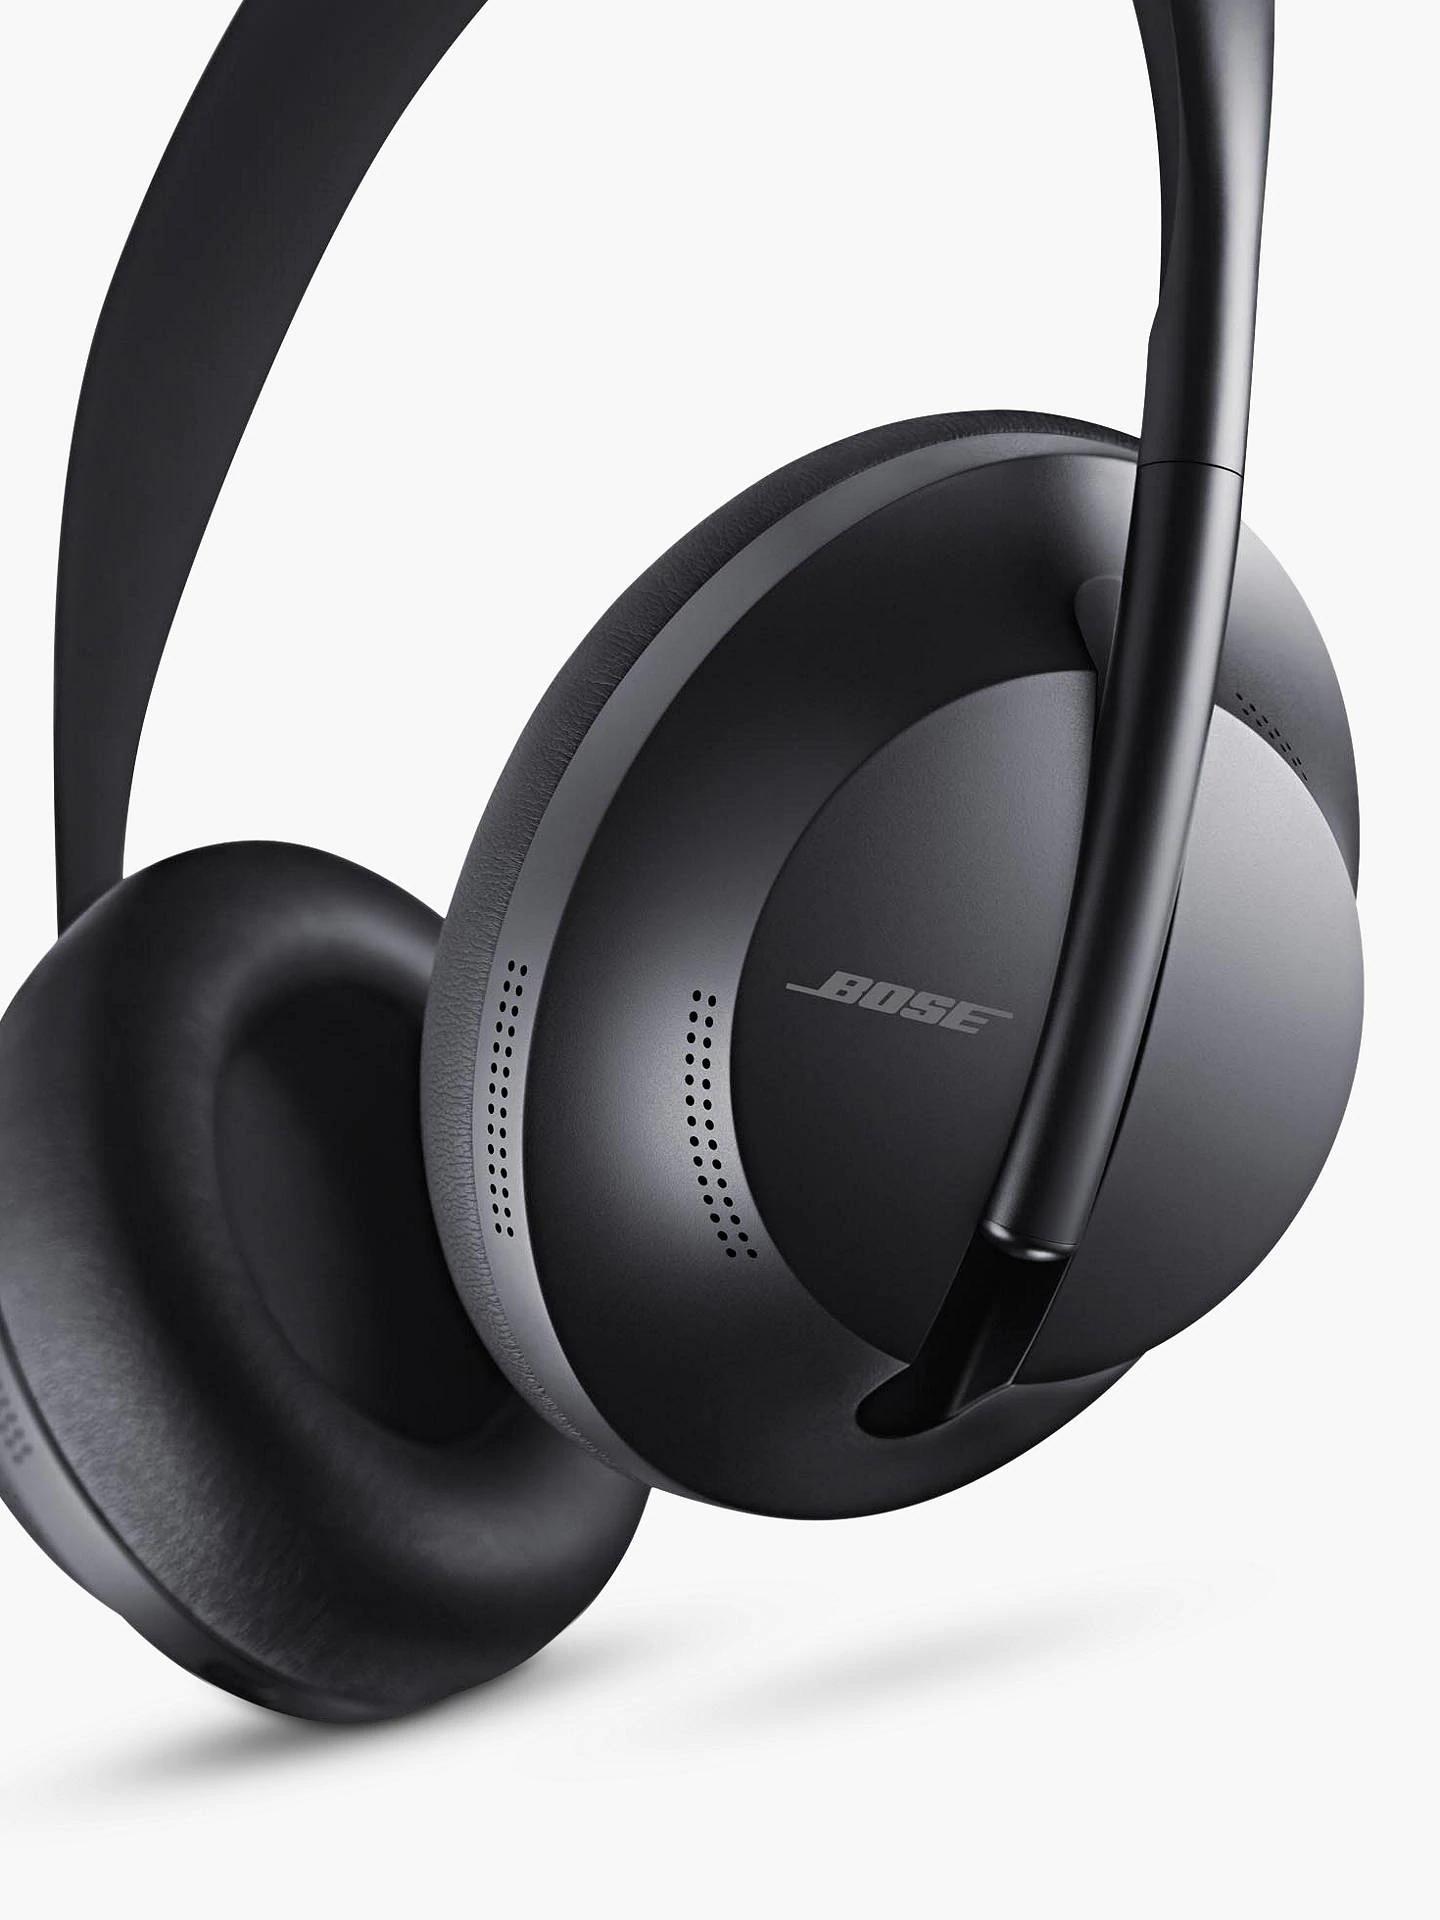 Bose 700 Headphones - John Lewis & Partners offering Price Match (RGB Direct) on Bose 700 Headphones - £279